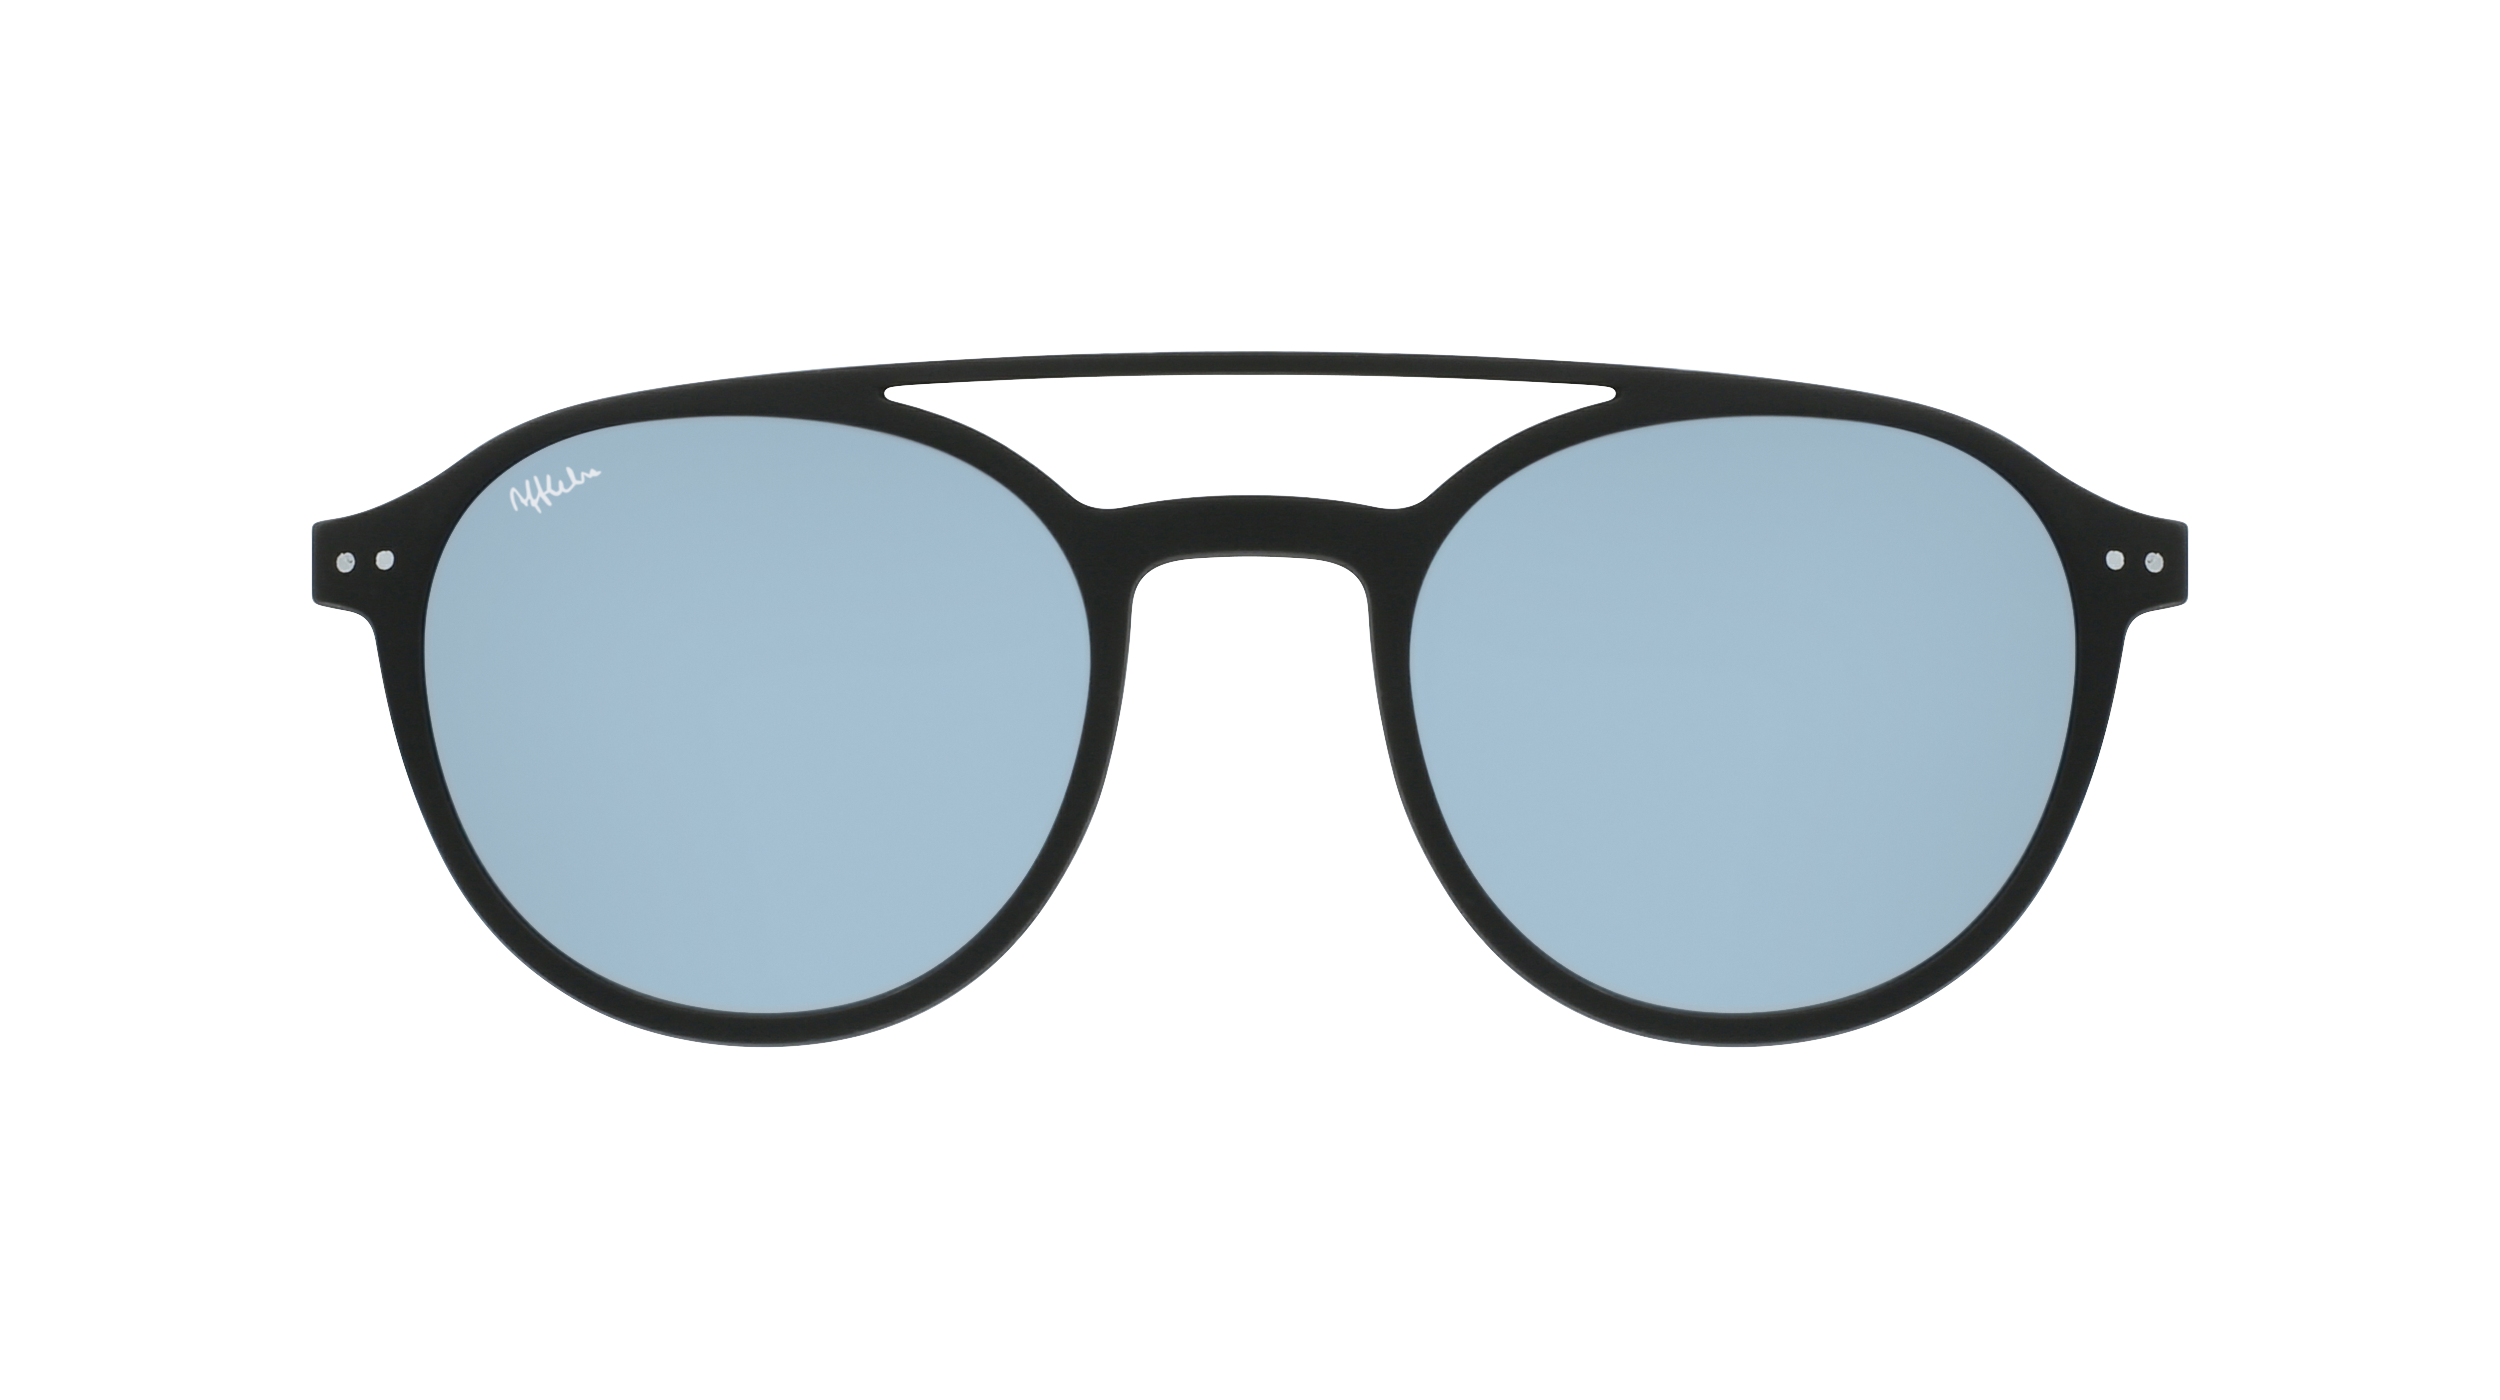 afflelou/france/products/smart_clip/clips_glasses/07630036458907.png